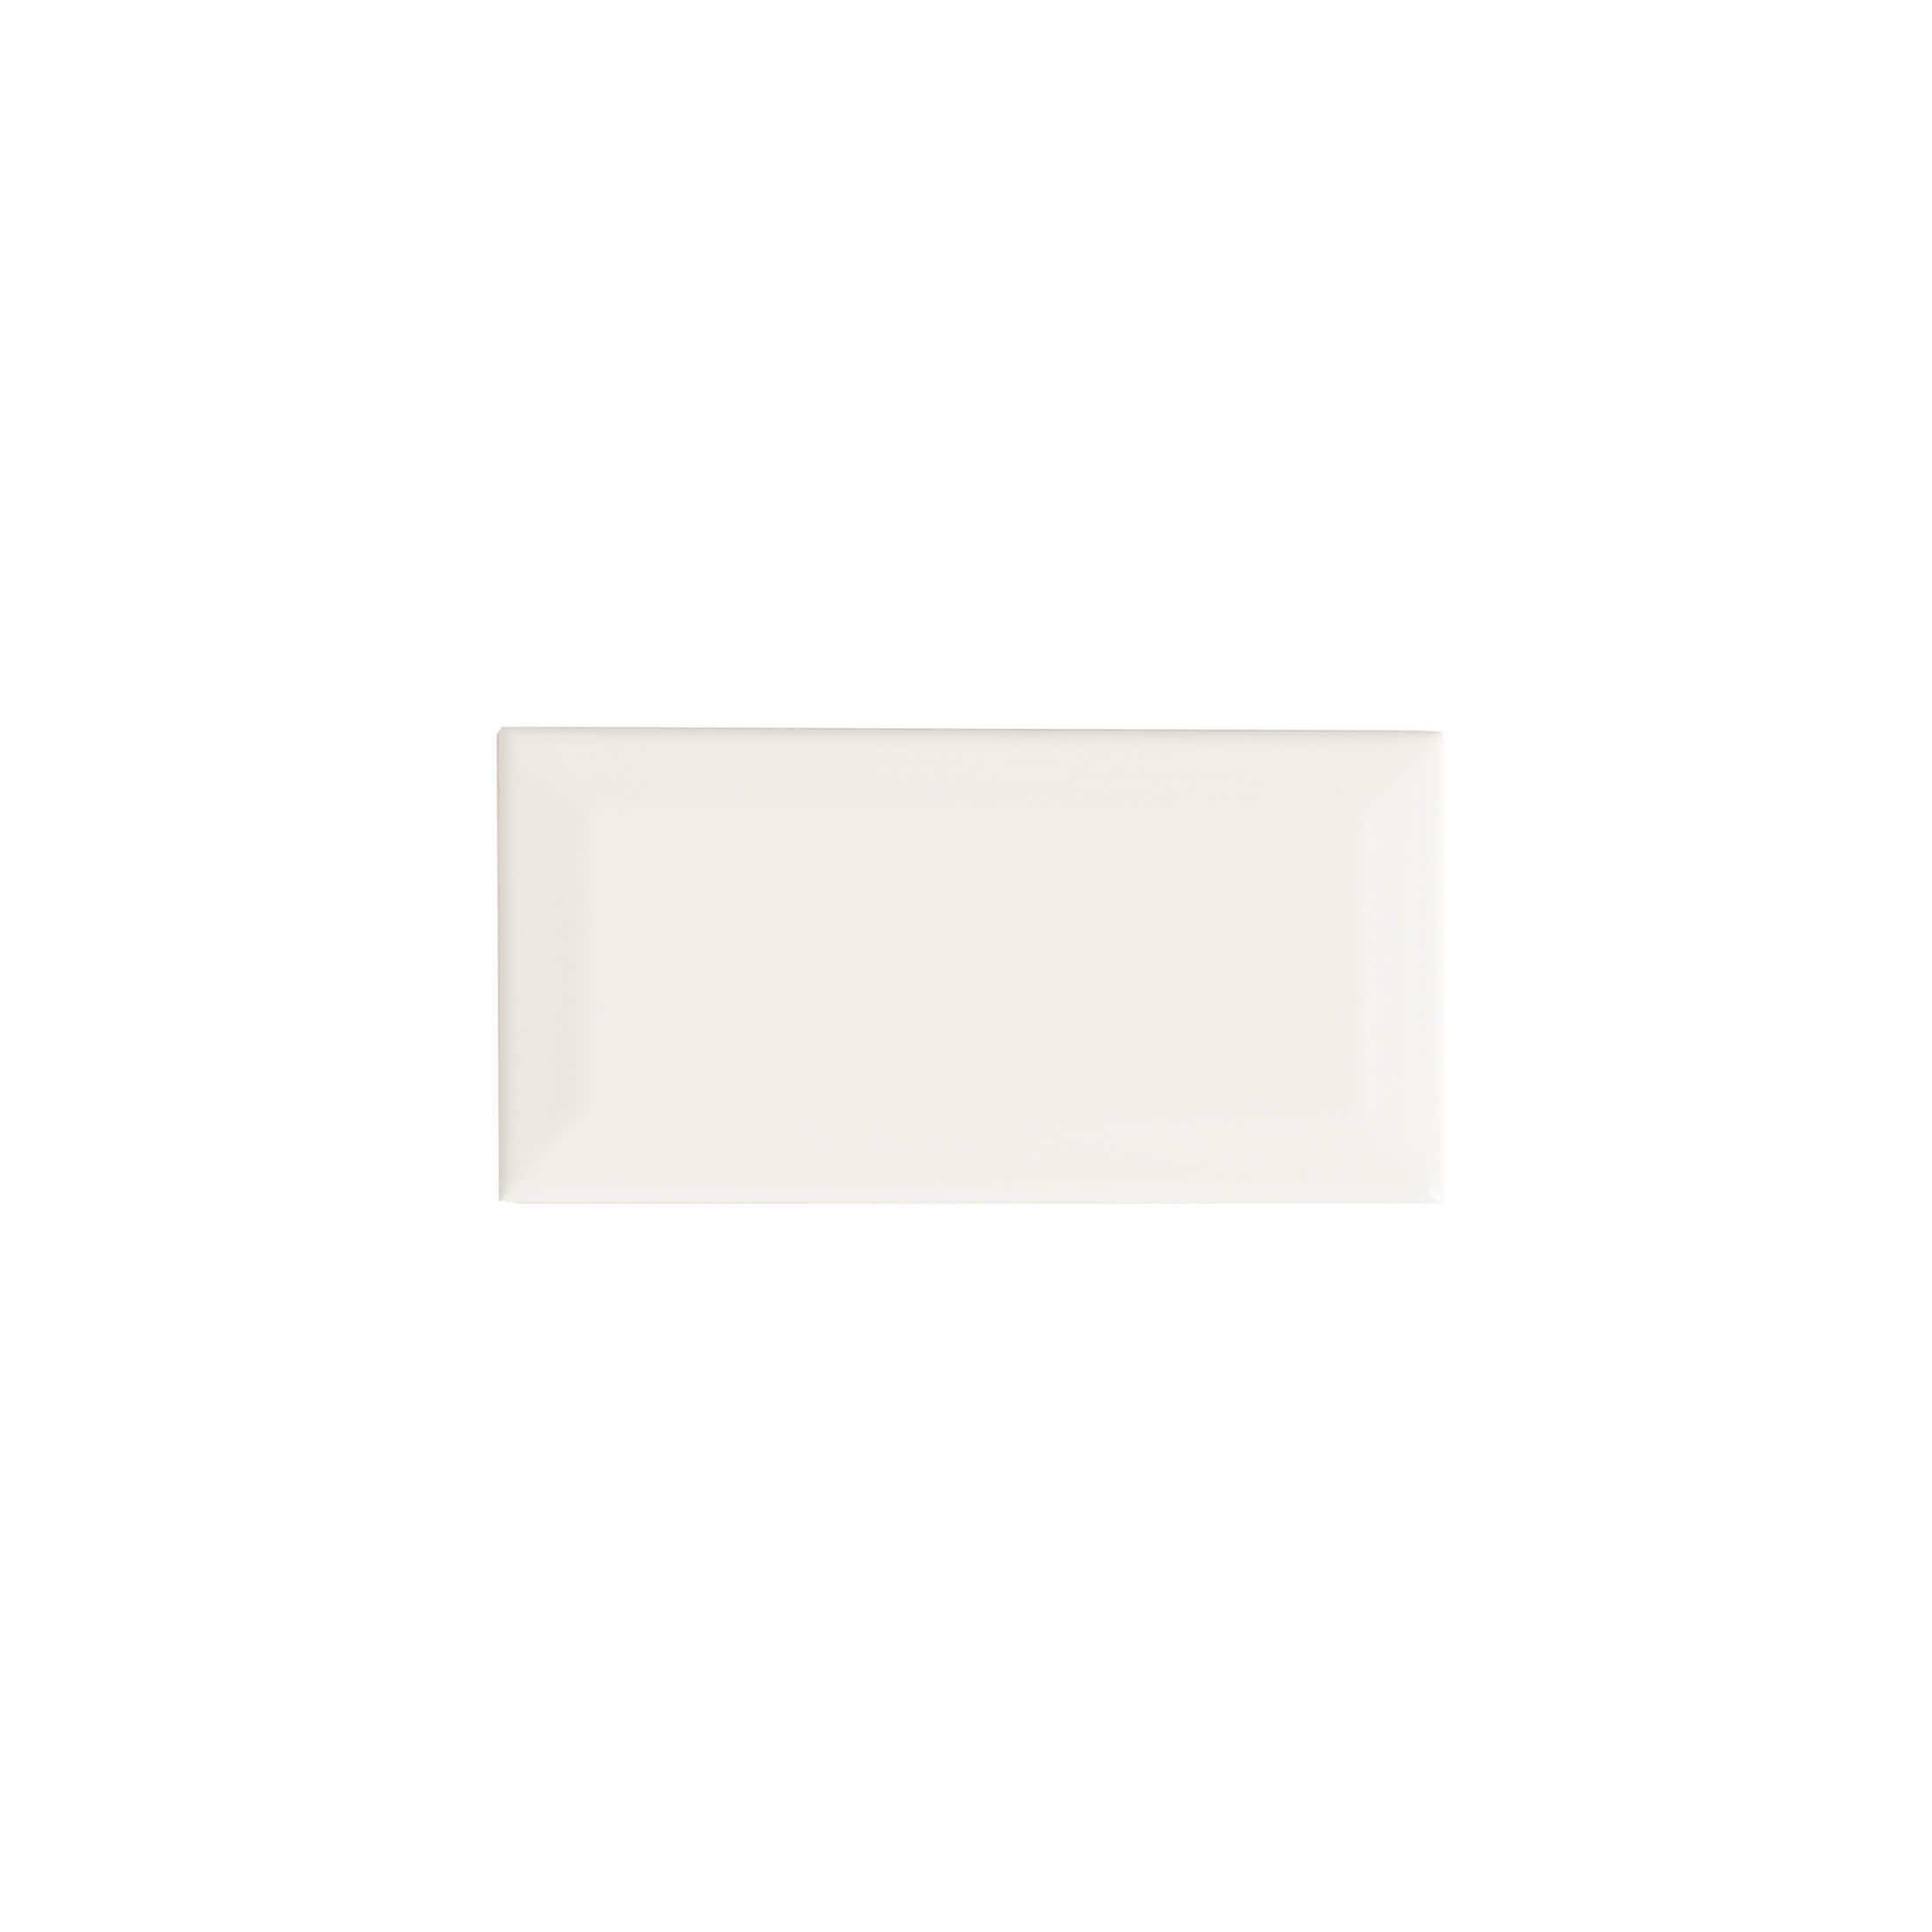 ADNE2018 - BISELADO PB - 7.5 cm X 15 cm